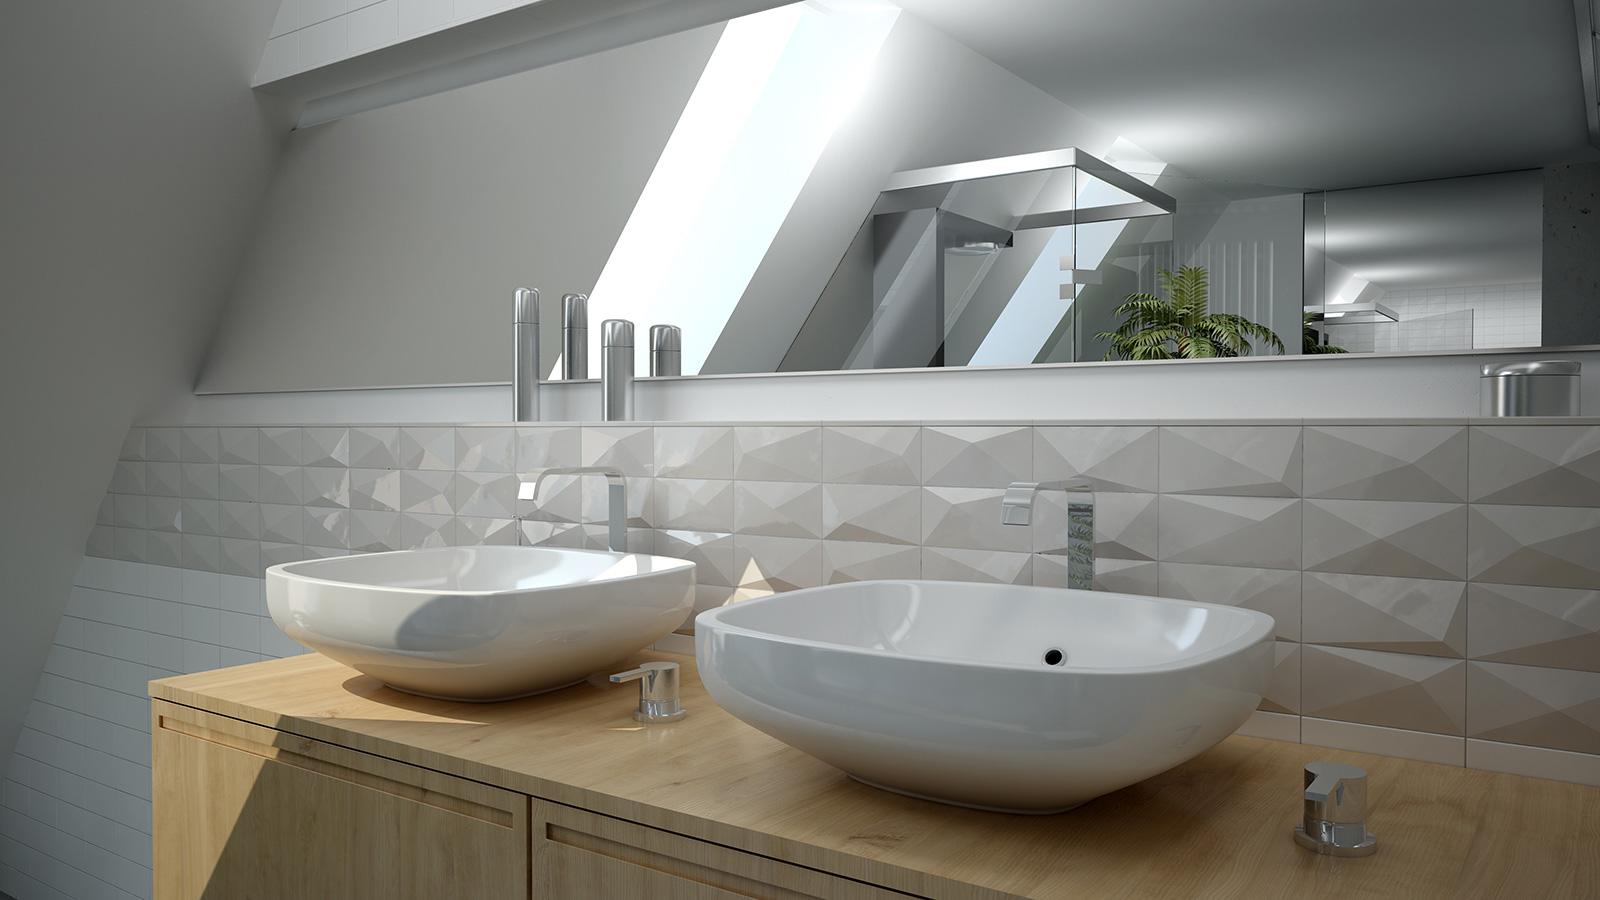 Ceramic-wall-tilesjpg.jpg